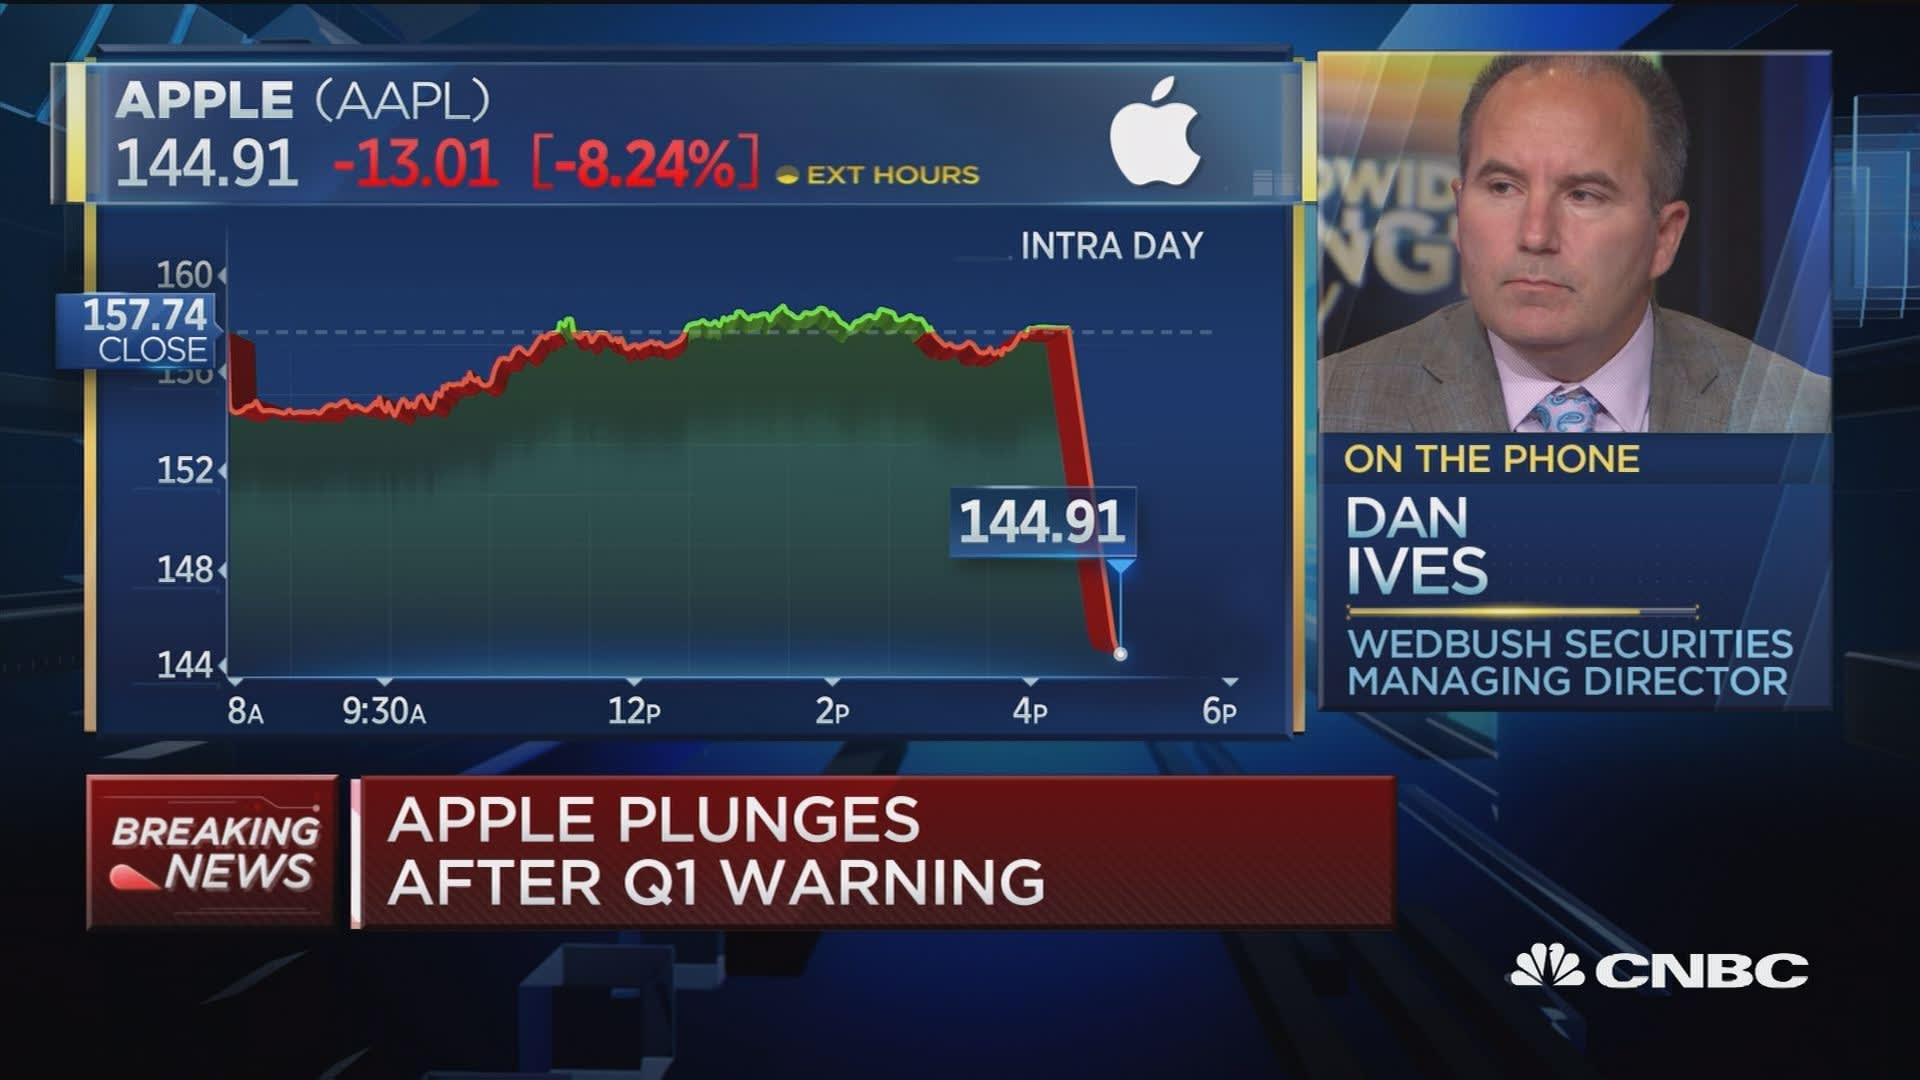 Lower guidance is a 'major black eye' for Apple, says Wedbush's Dan Ives